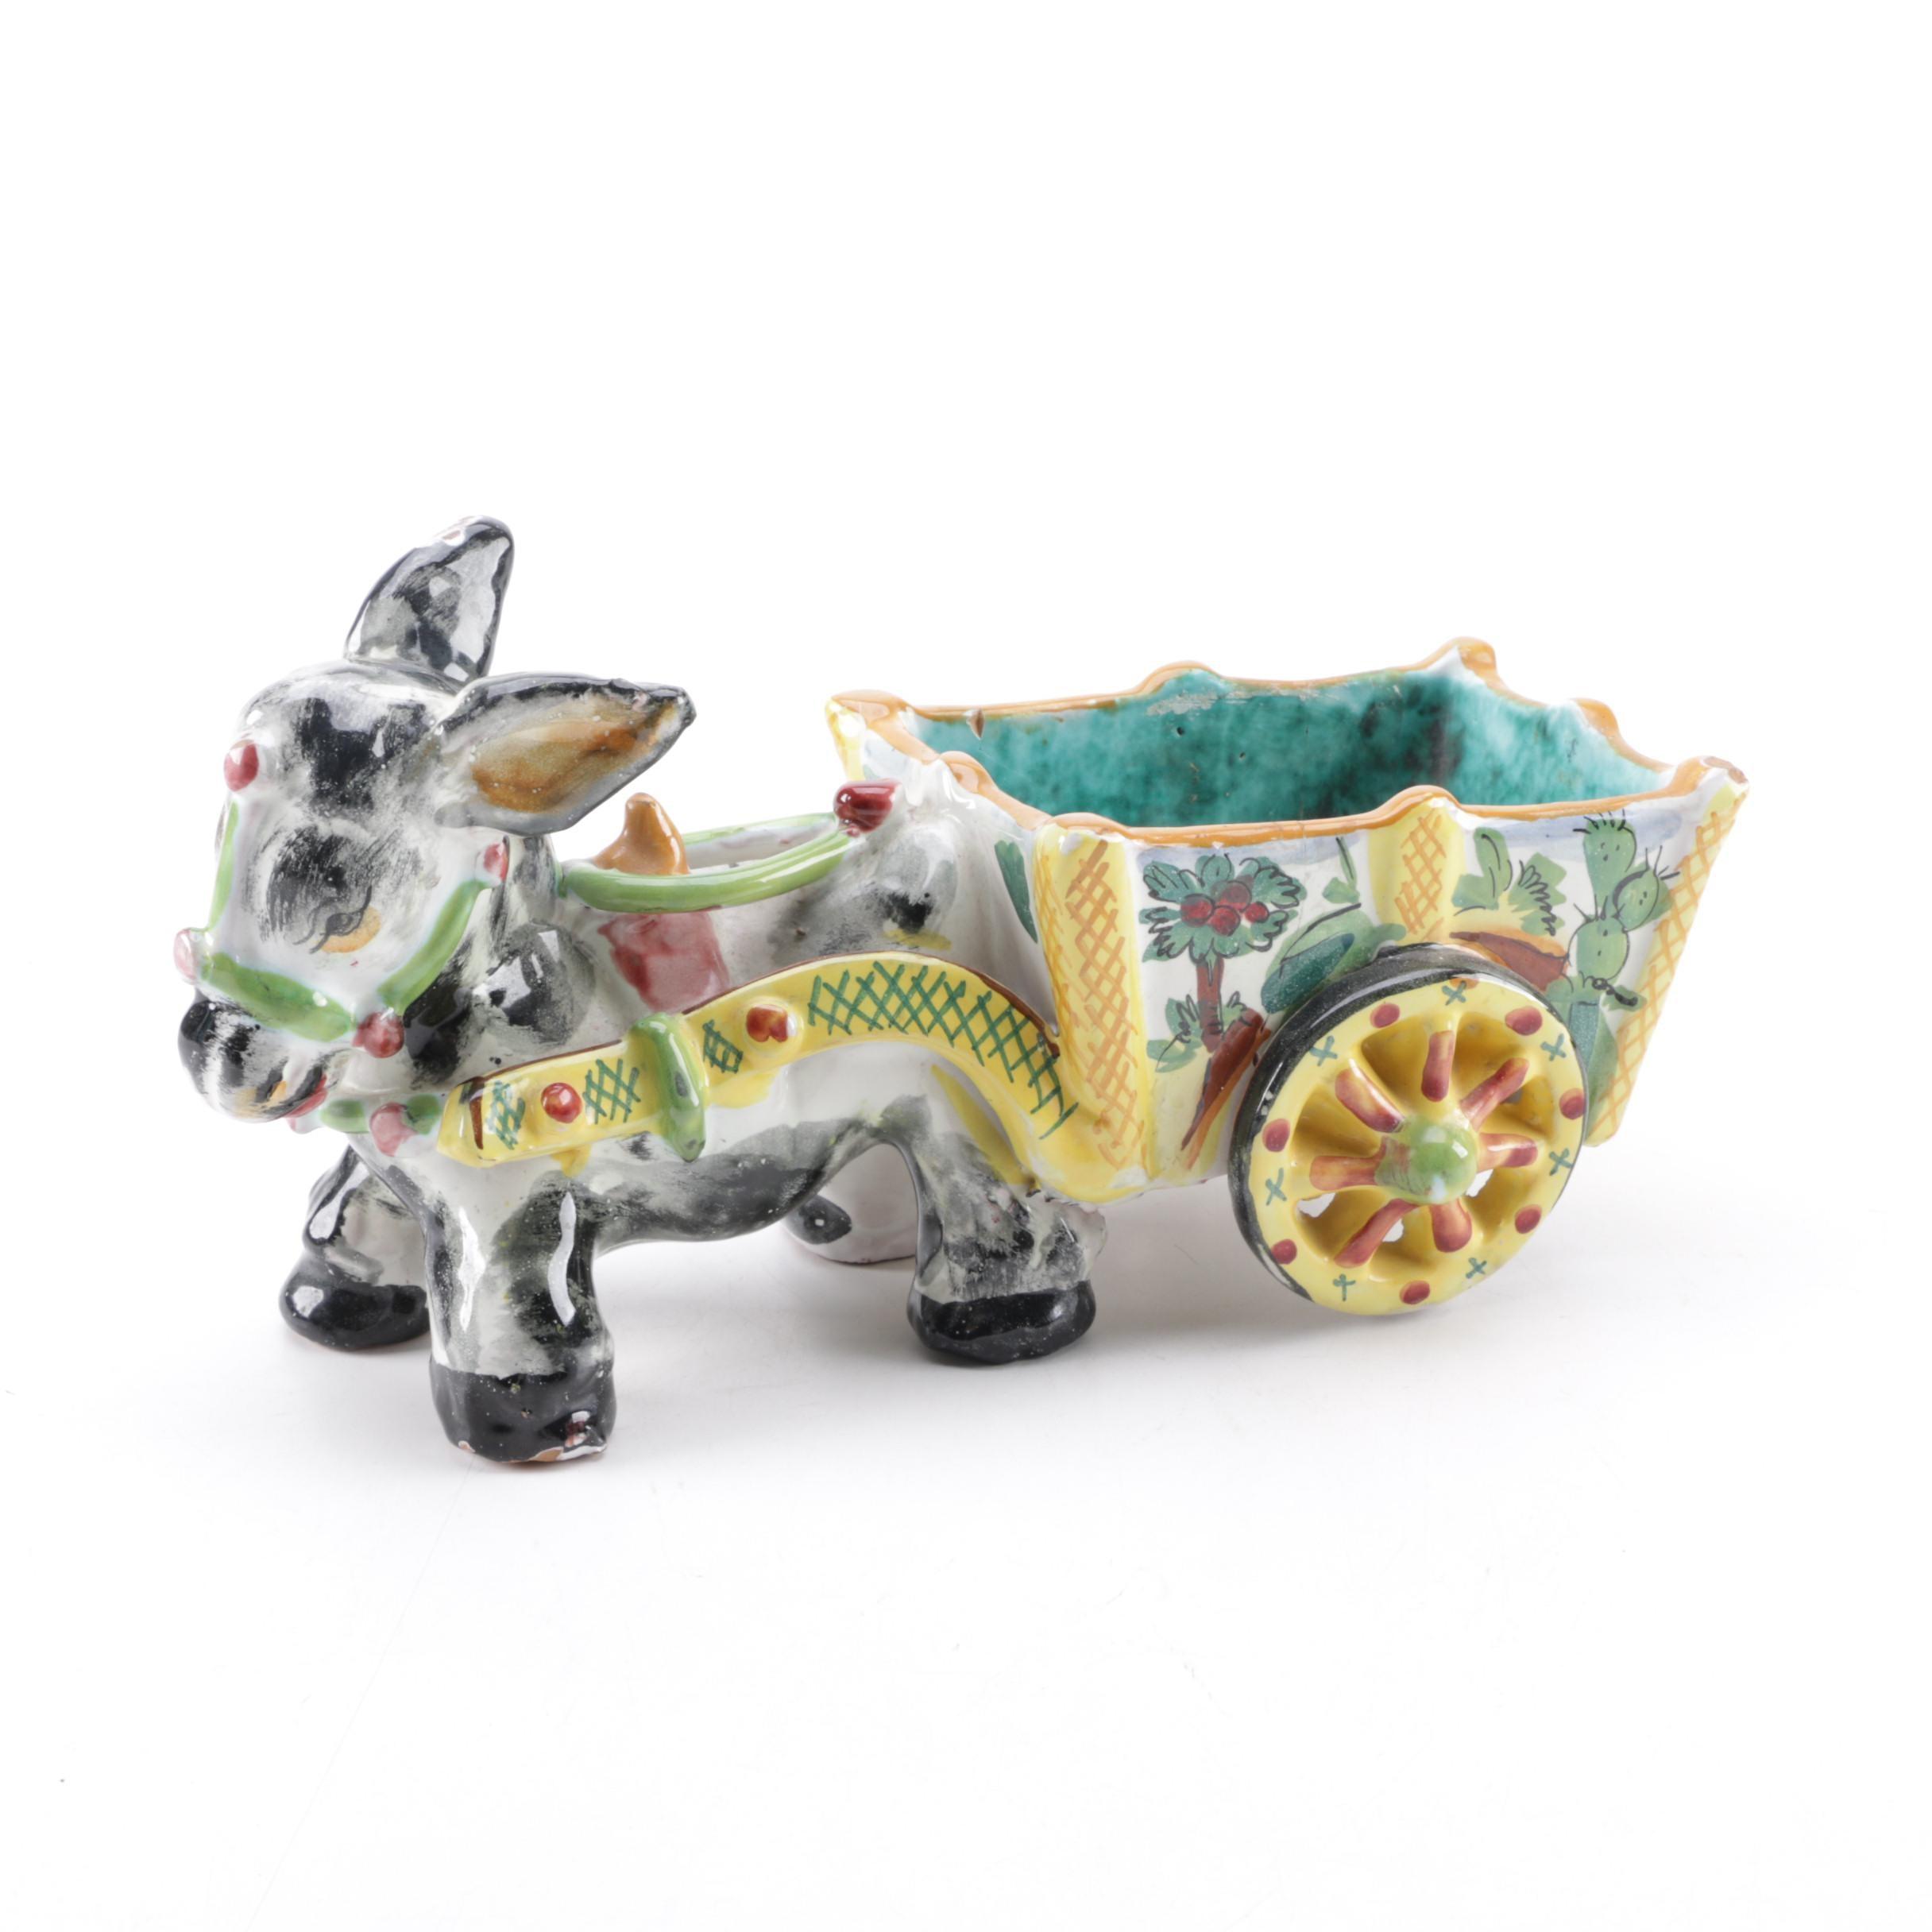 Vintage Italian Glazed Terra Cotta Donkey and Cart Figurine